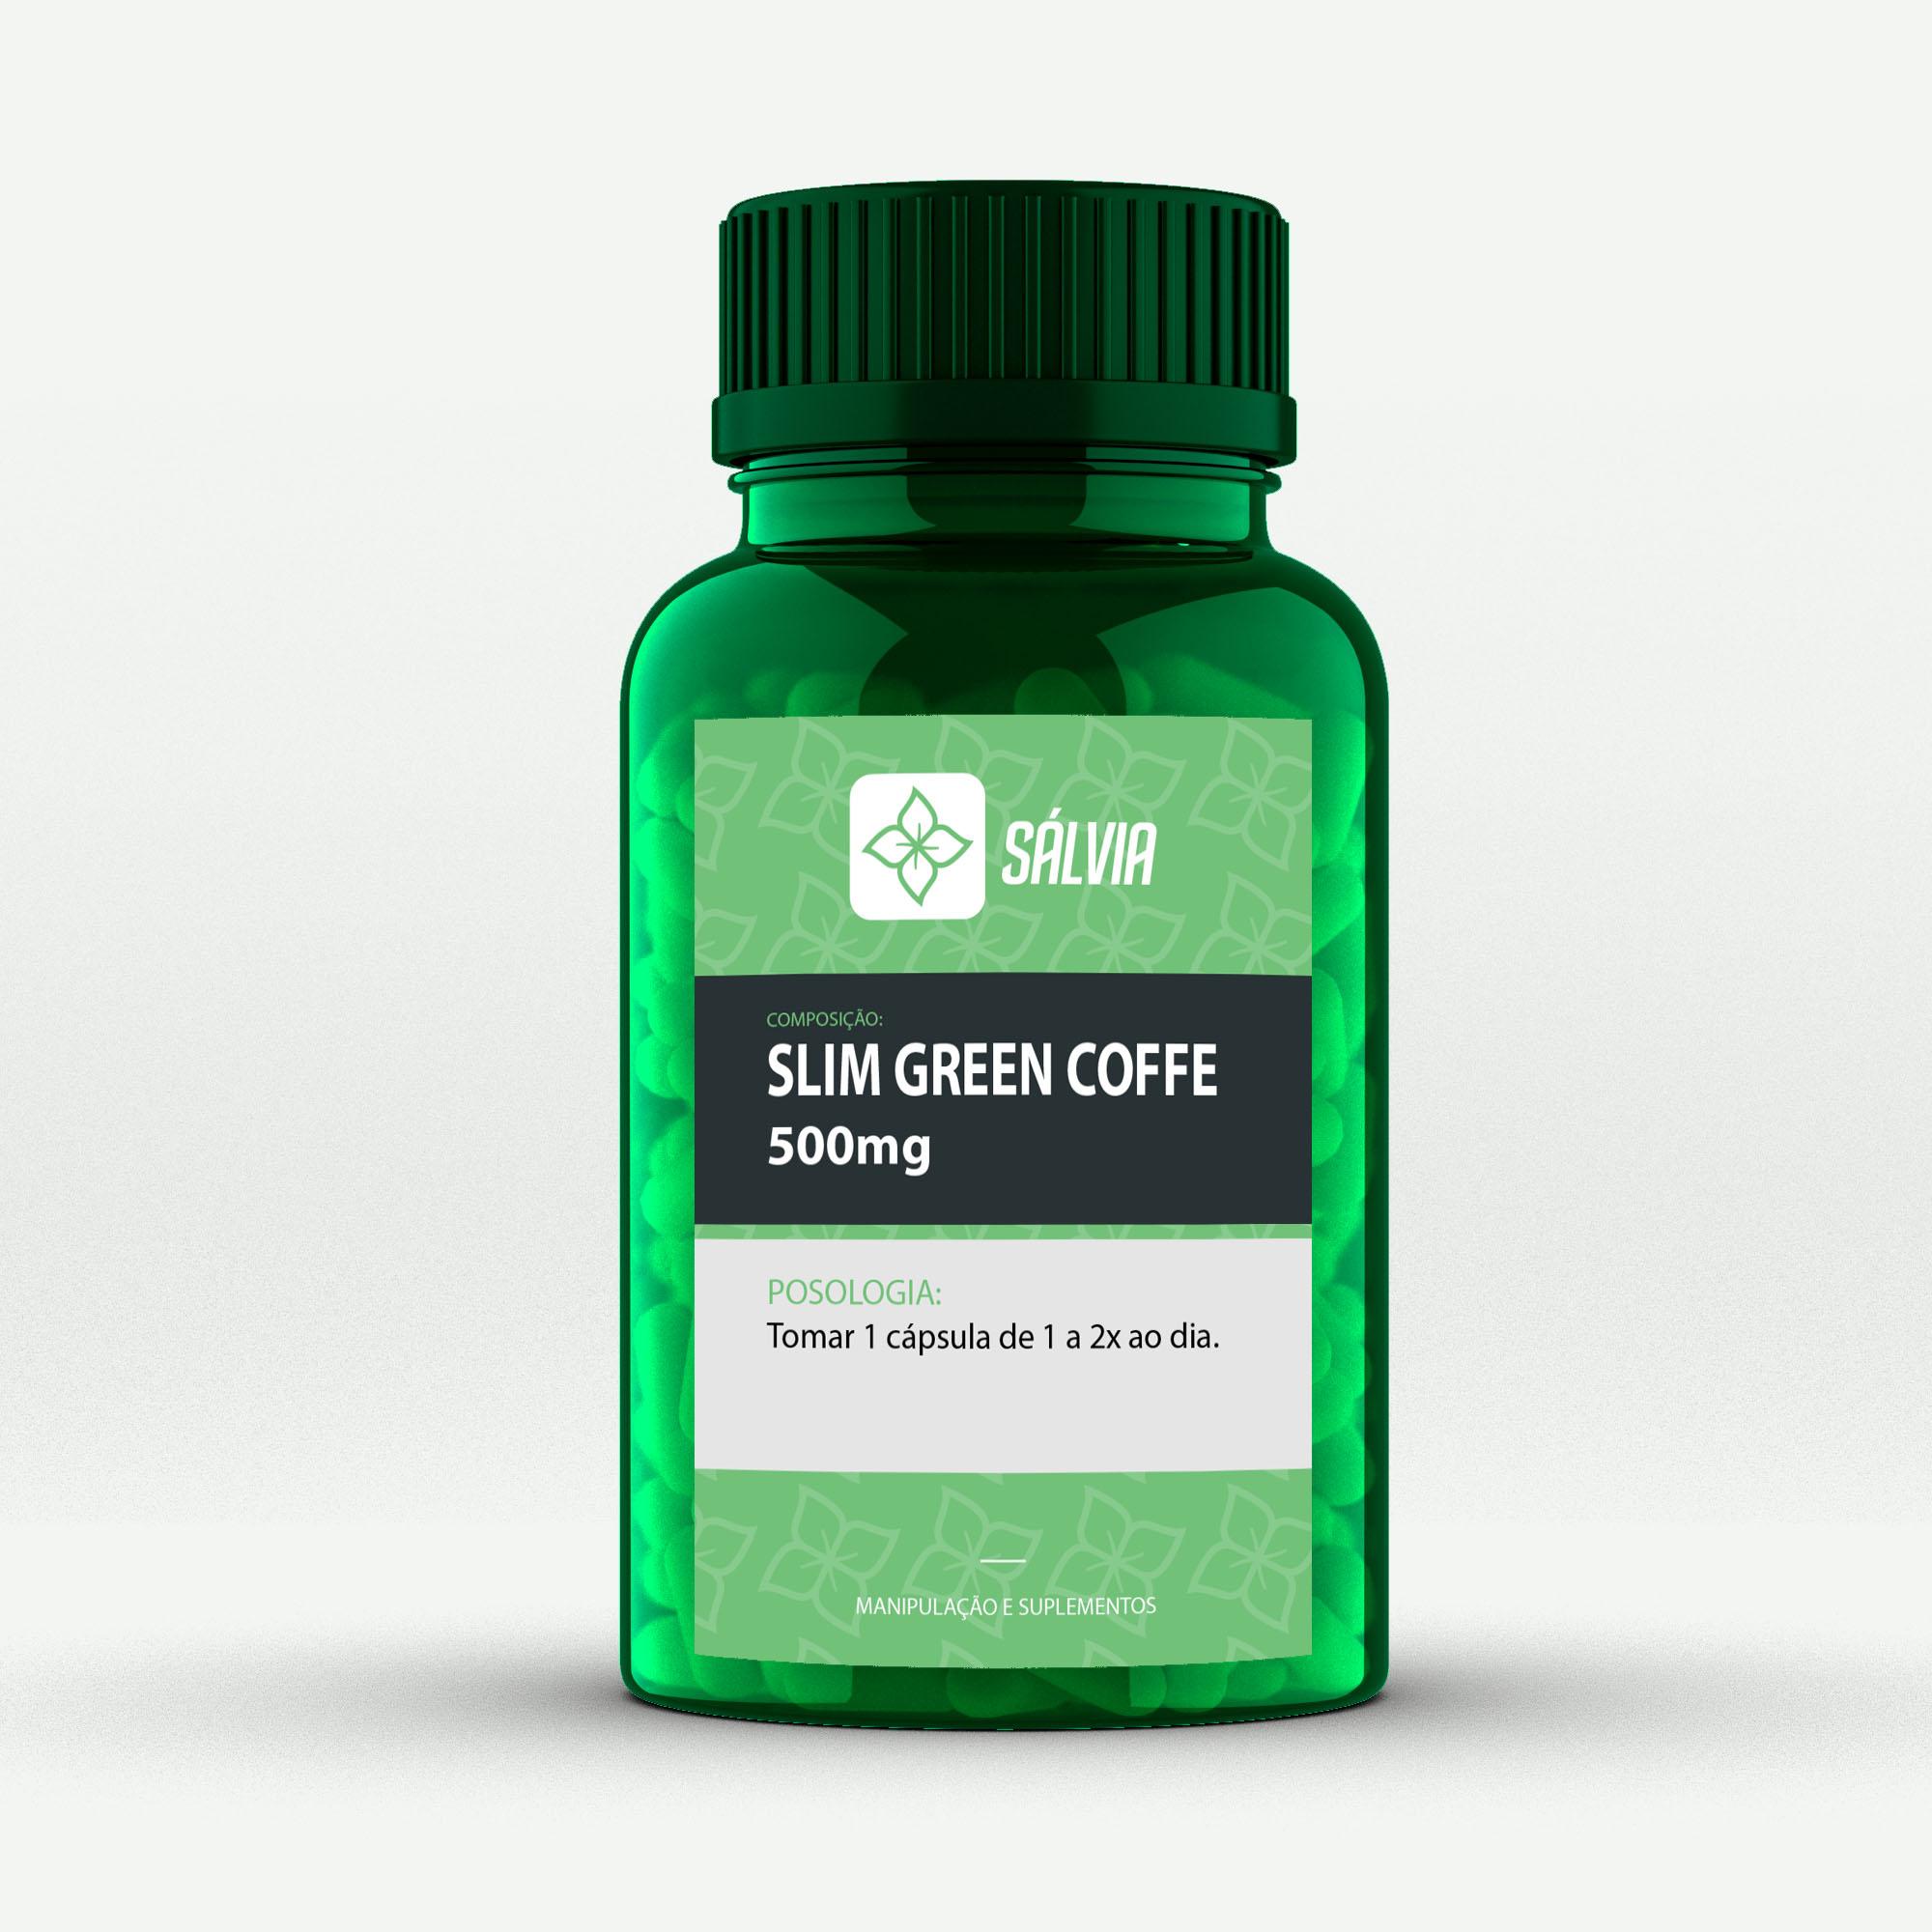 SLIM GREEN COFFE 500mg - Cápsulas